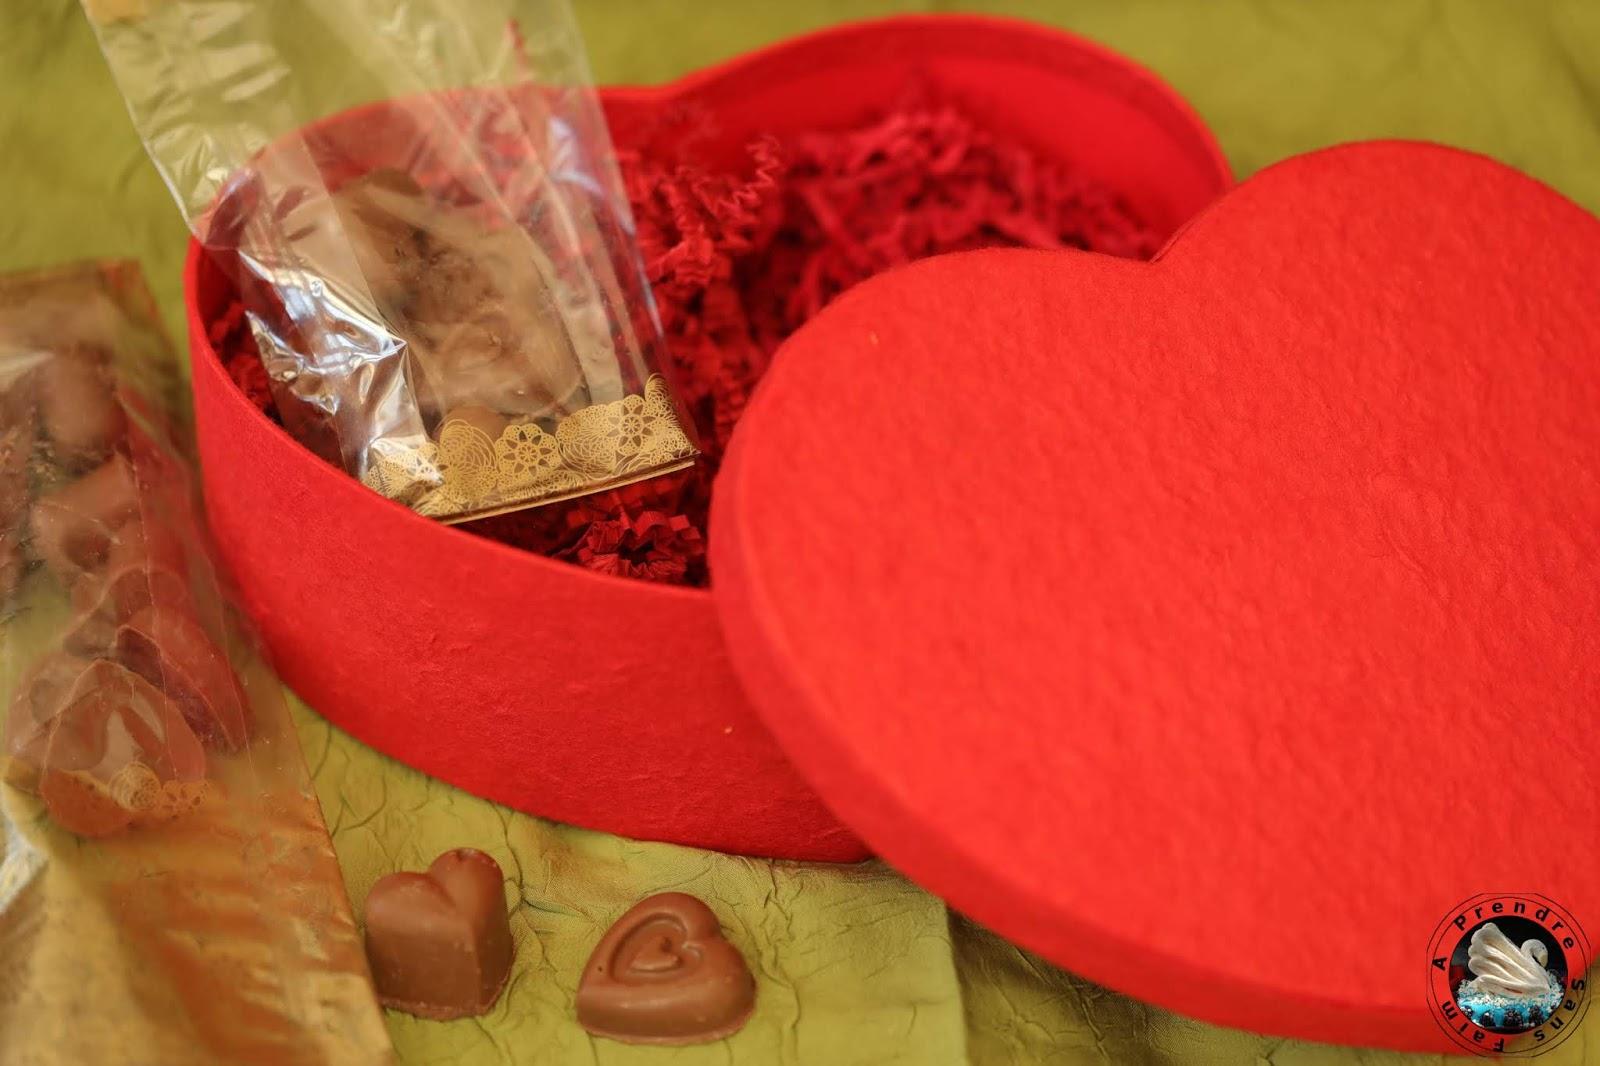 Chocolats de Saint-Valentin à offrir